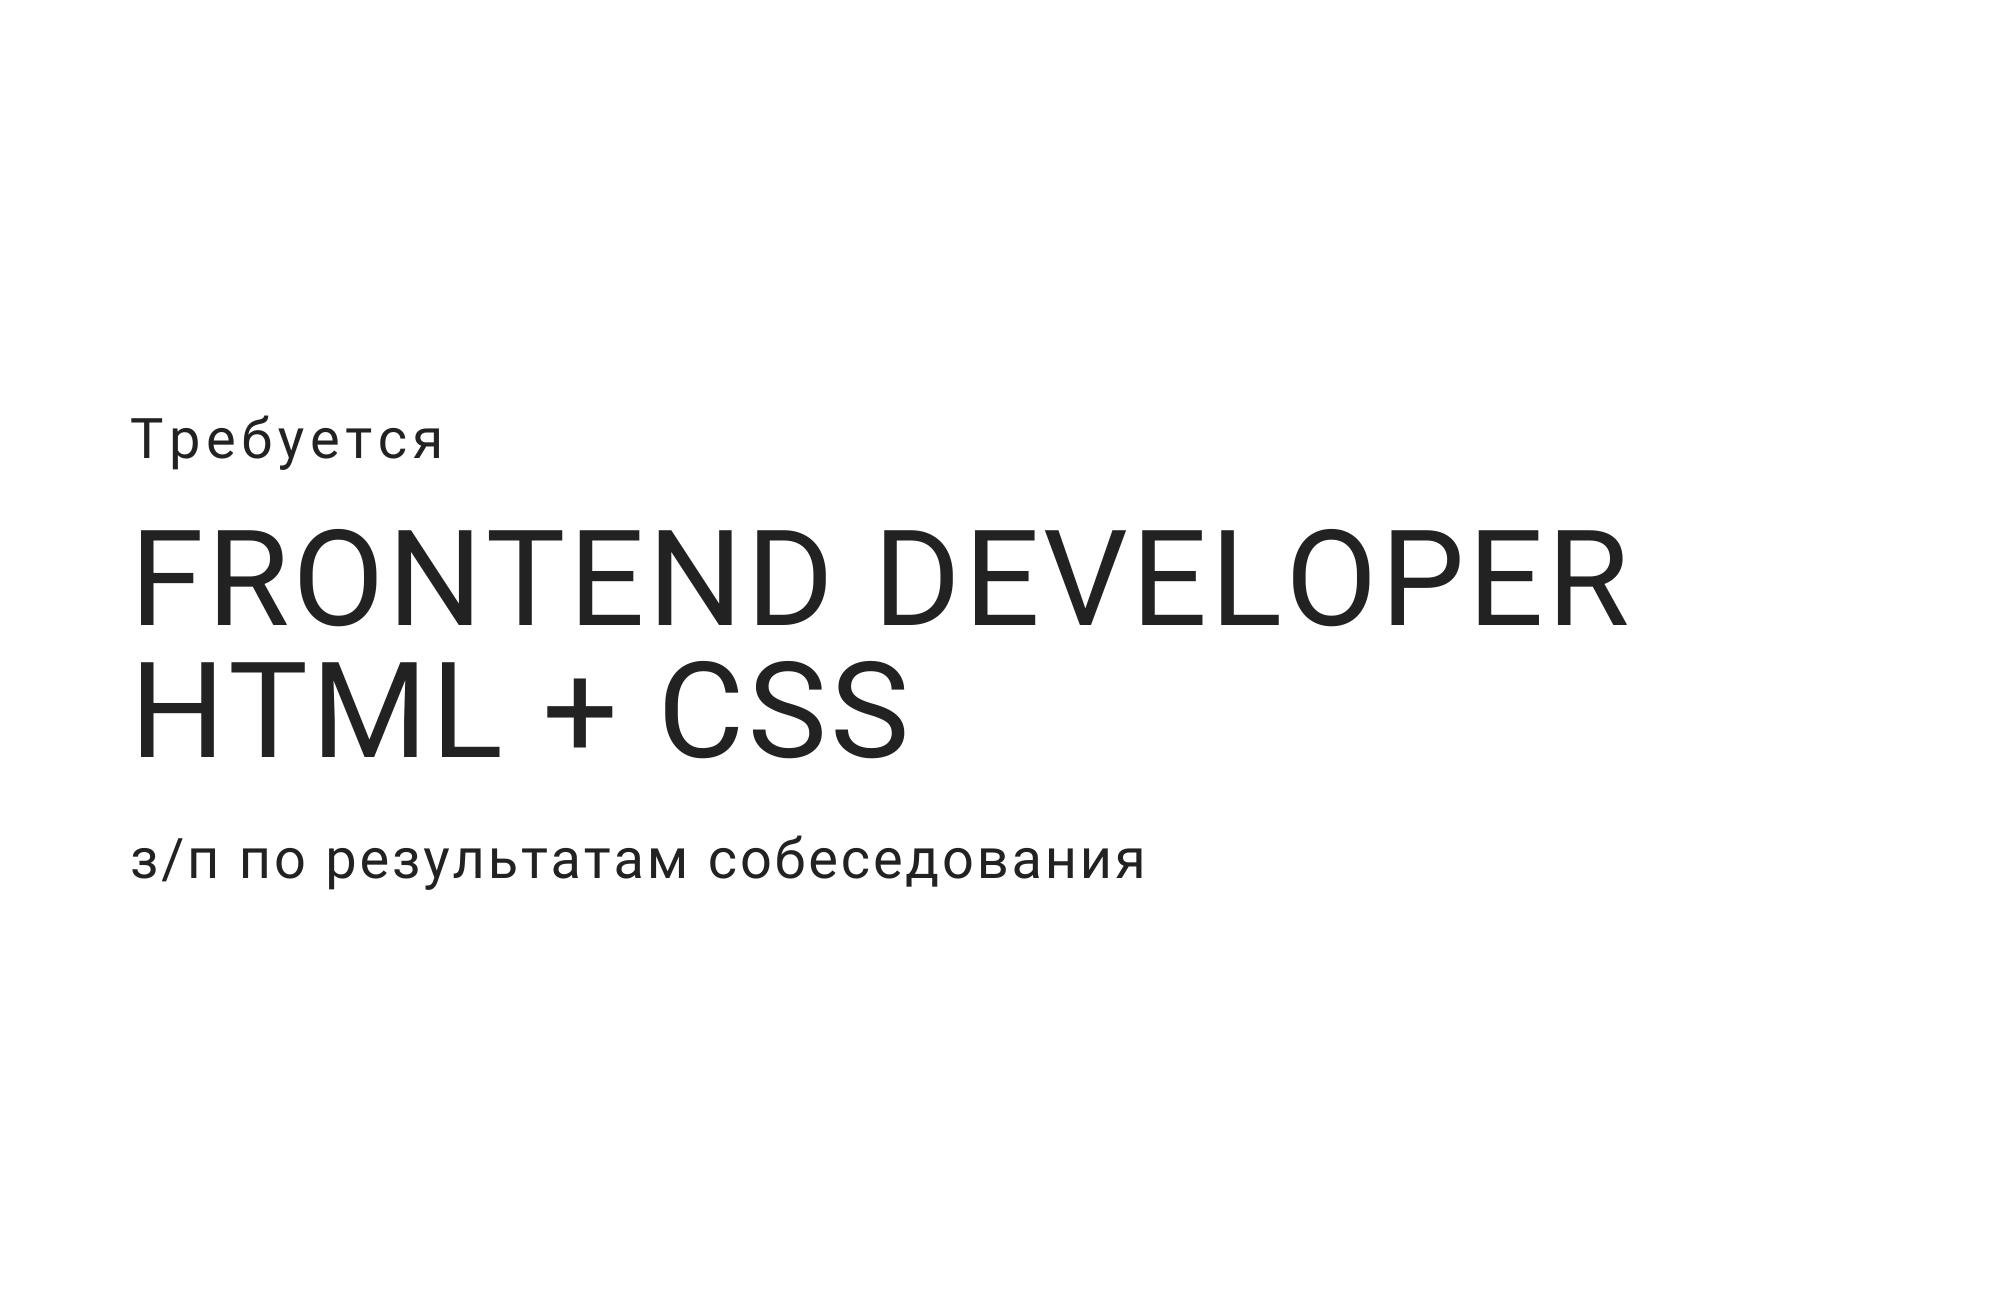 Frontend developer HTML + CSS